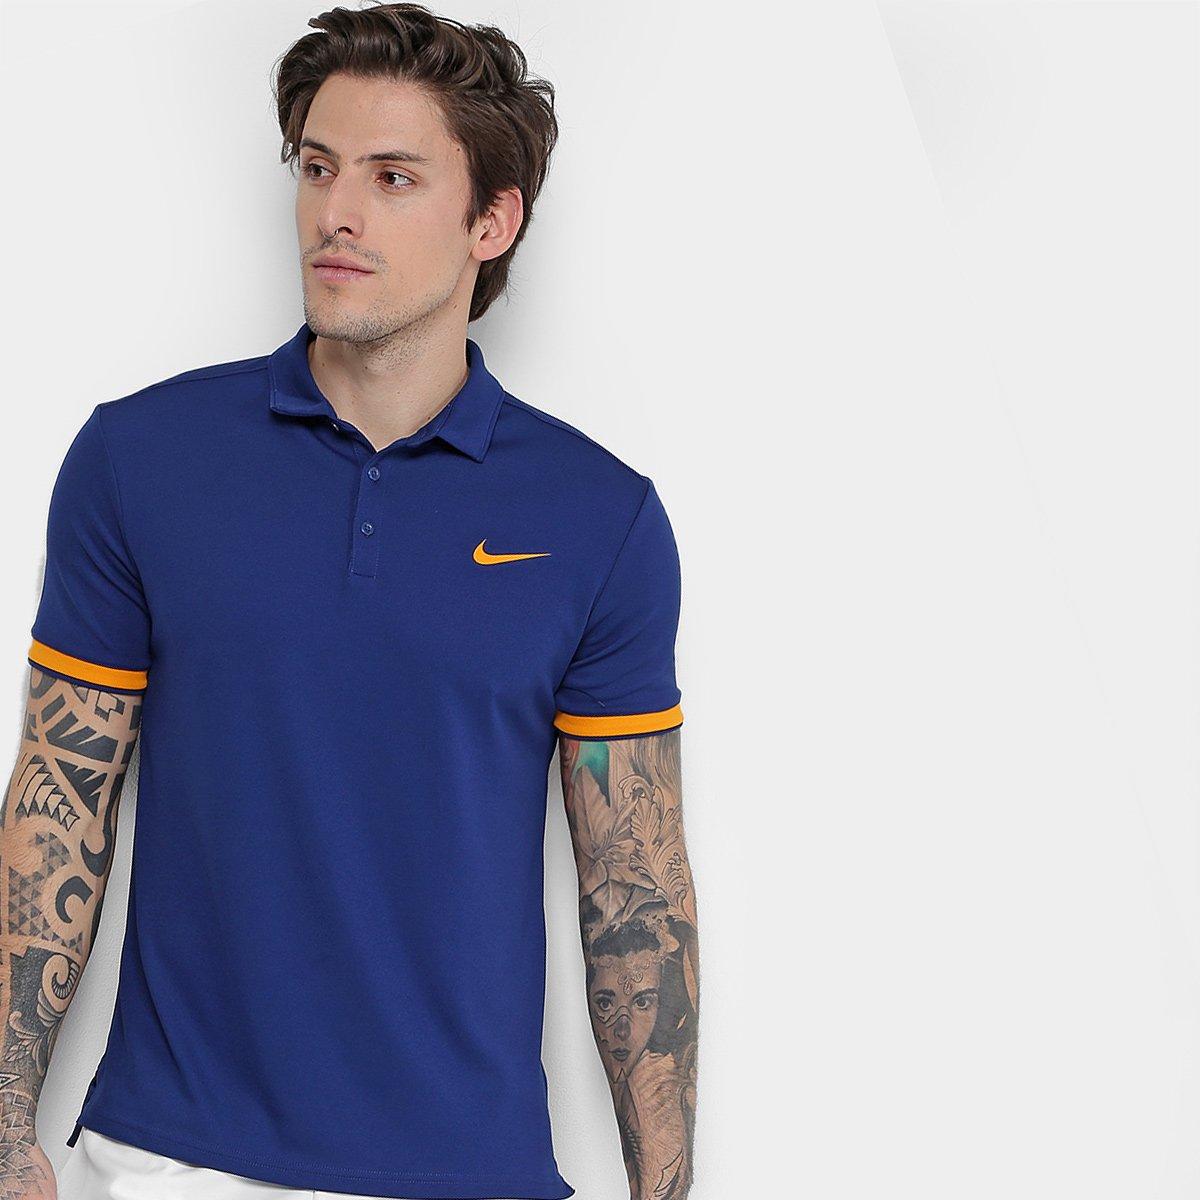 Camiseta Polo Nike Team Masculina - Compre Agora  fab3dea2d3563